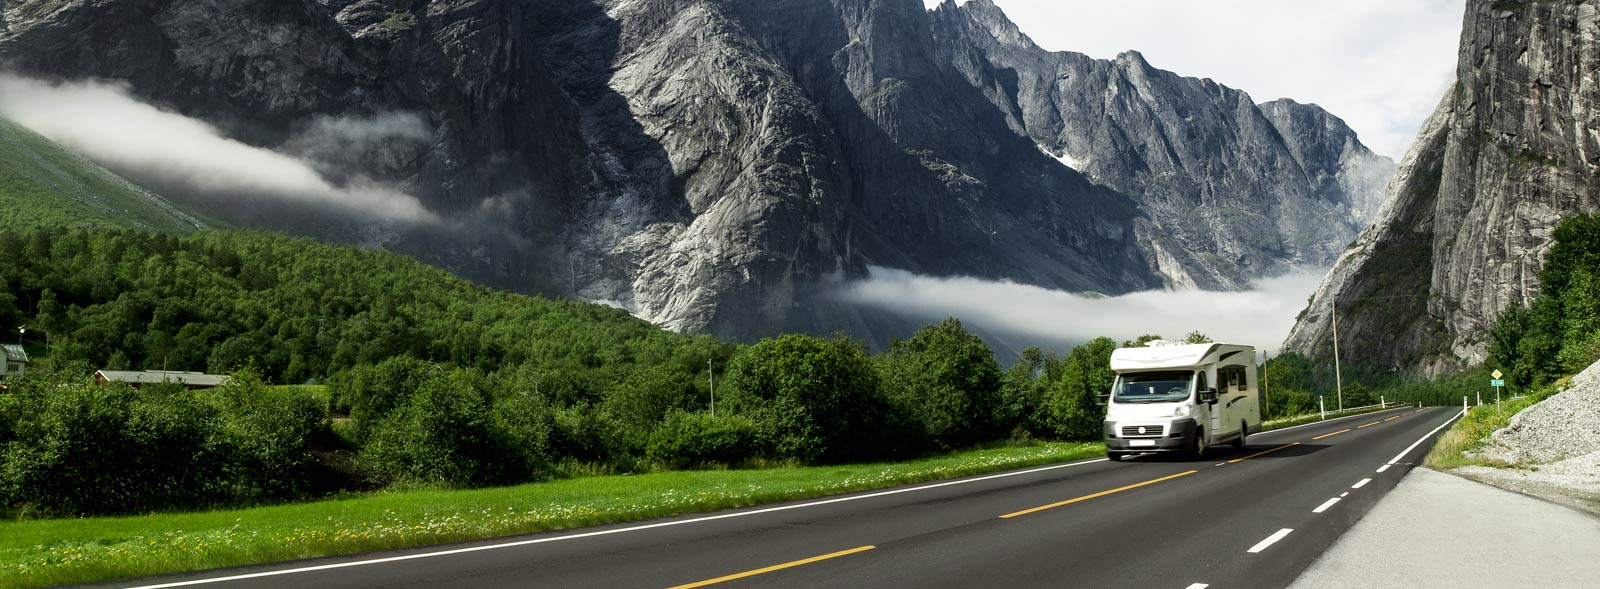 motorhome on highway